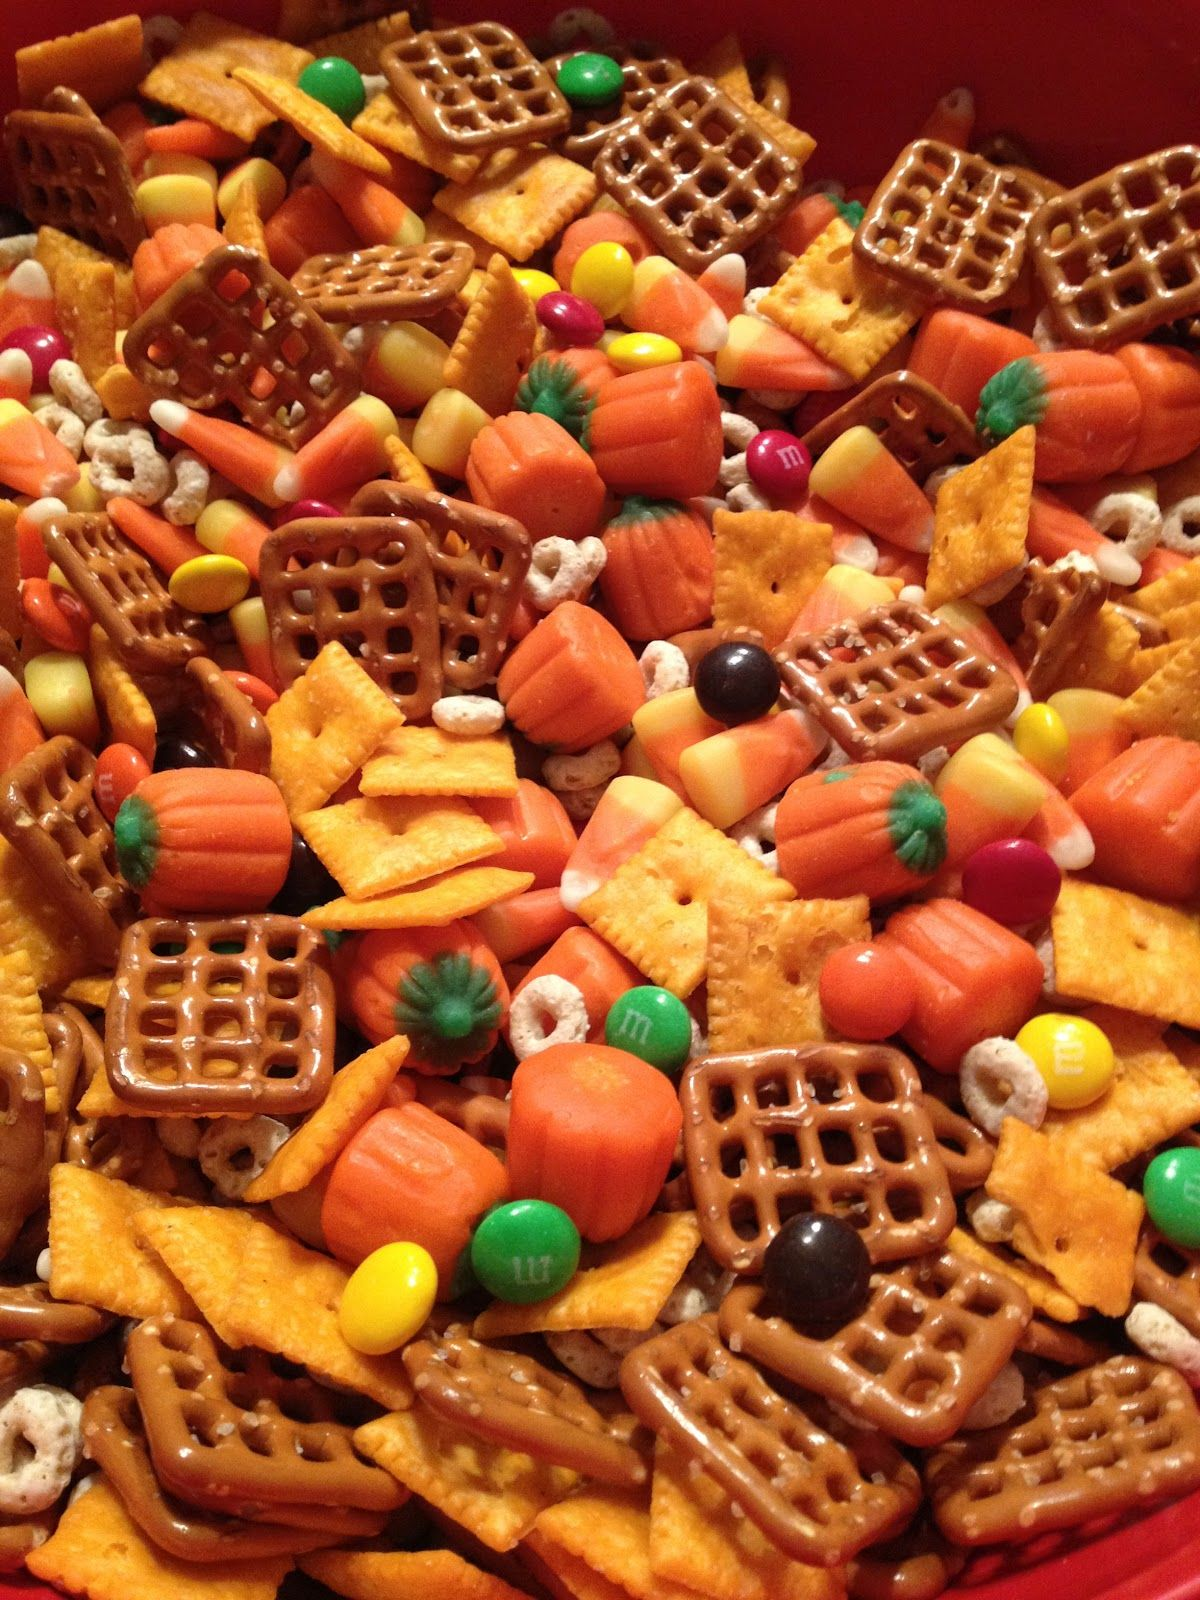 Pin by DeShone Harris on Fall ideas Halloween treats for